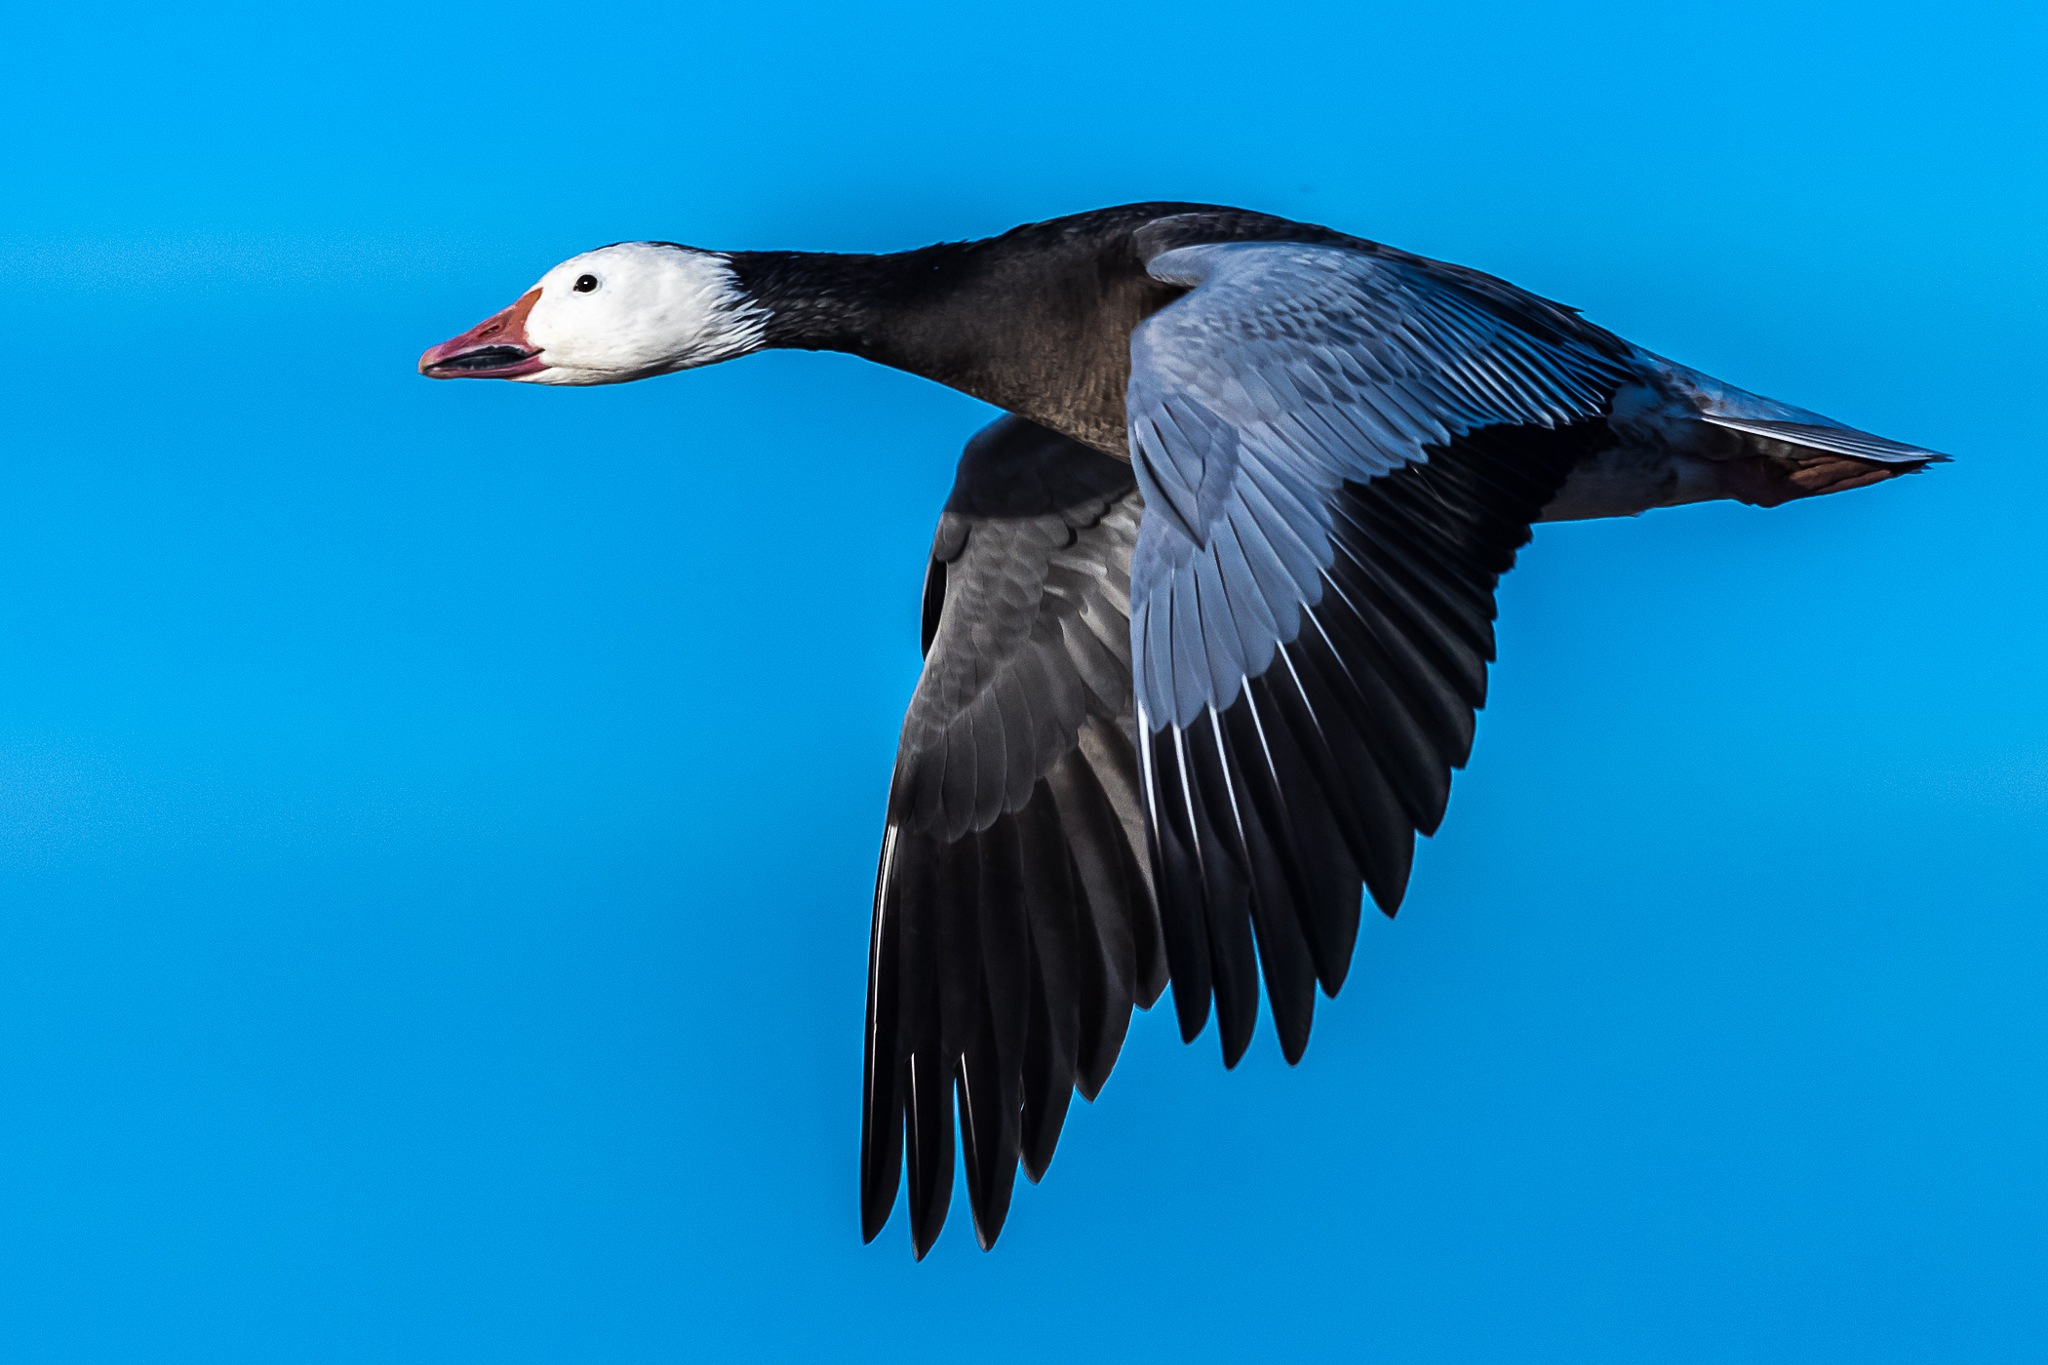 Blue Morph Snow Goose in Flight by Steve Aicinena